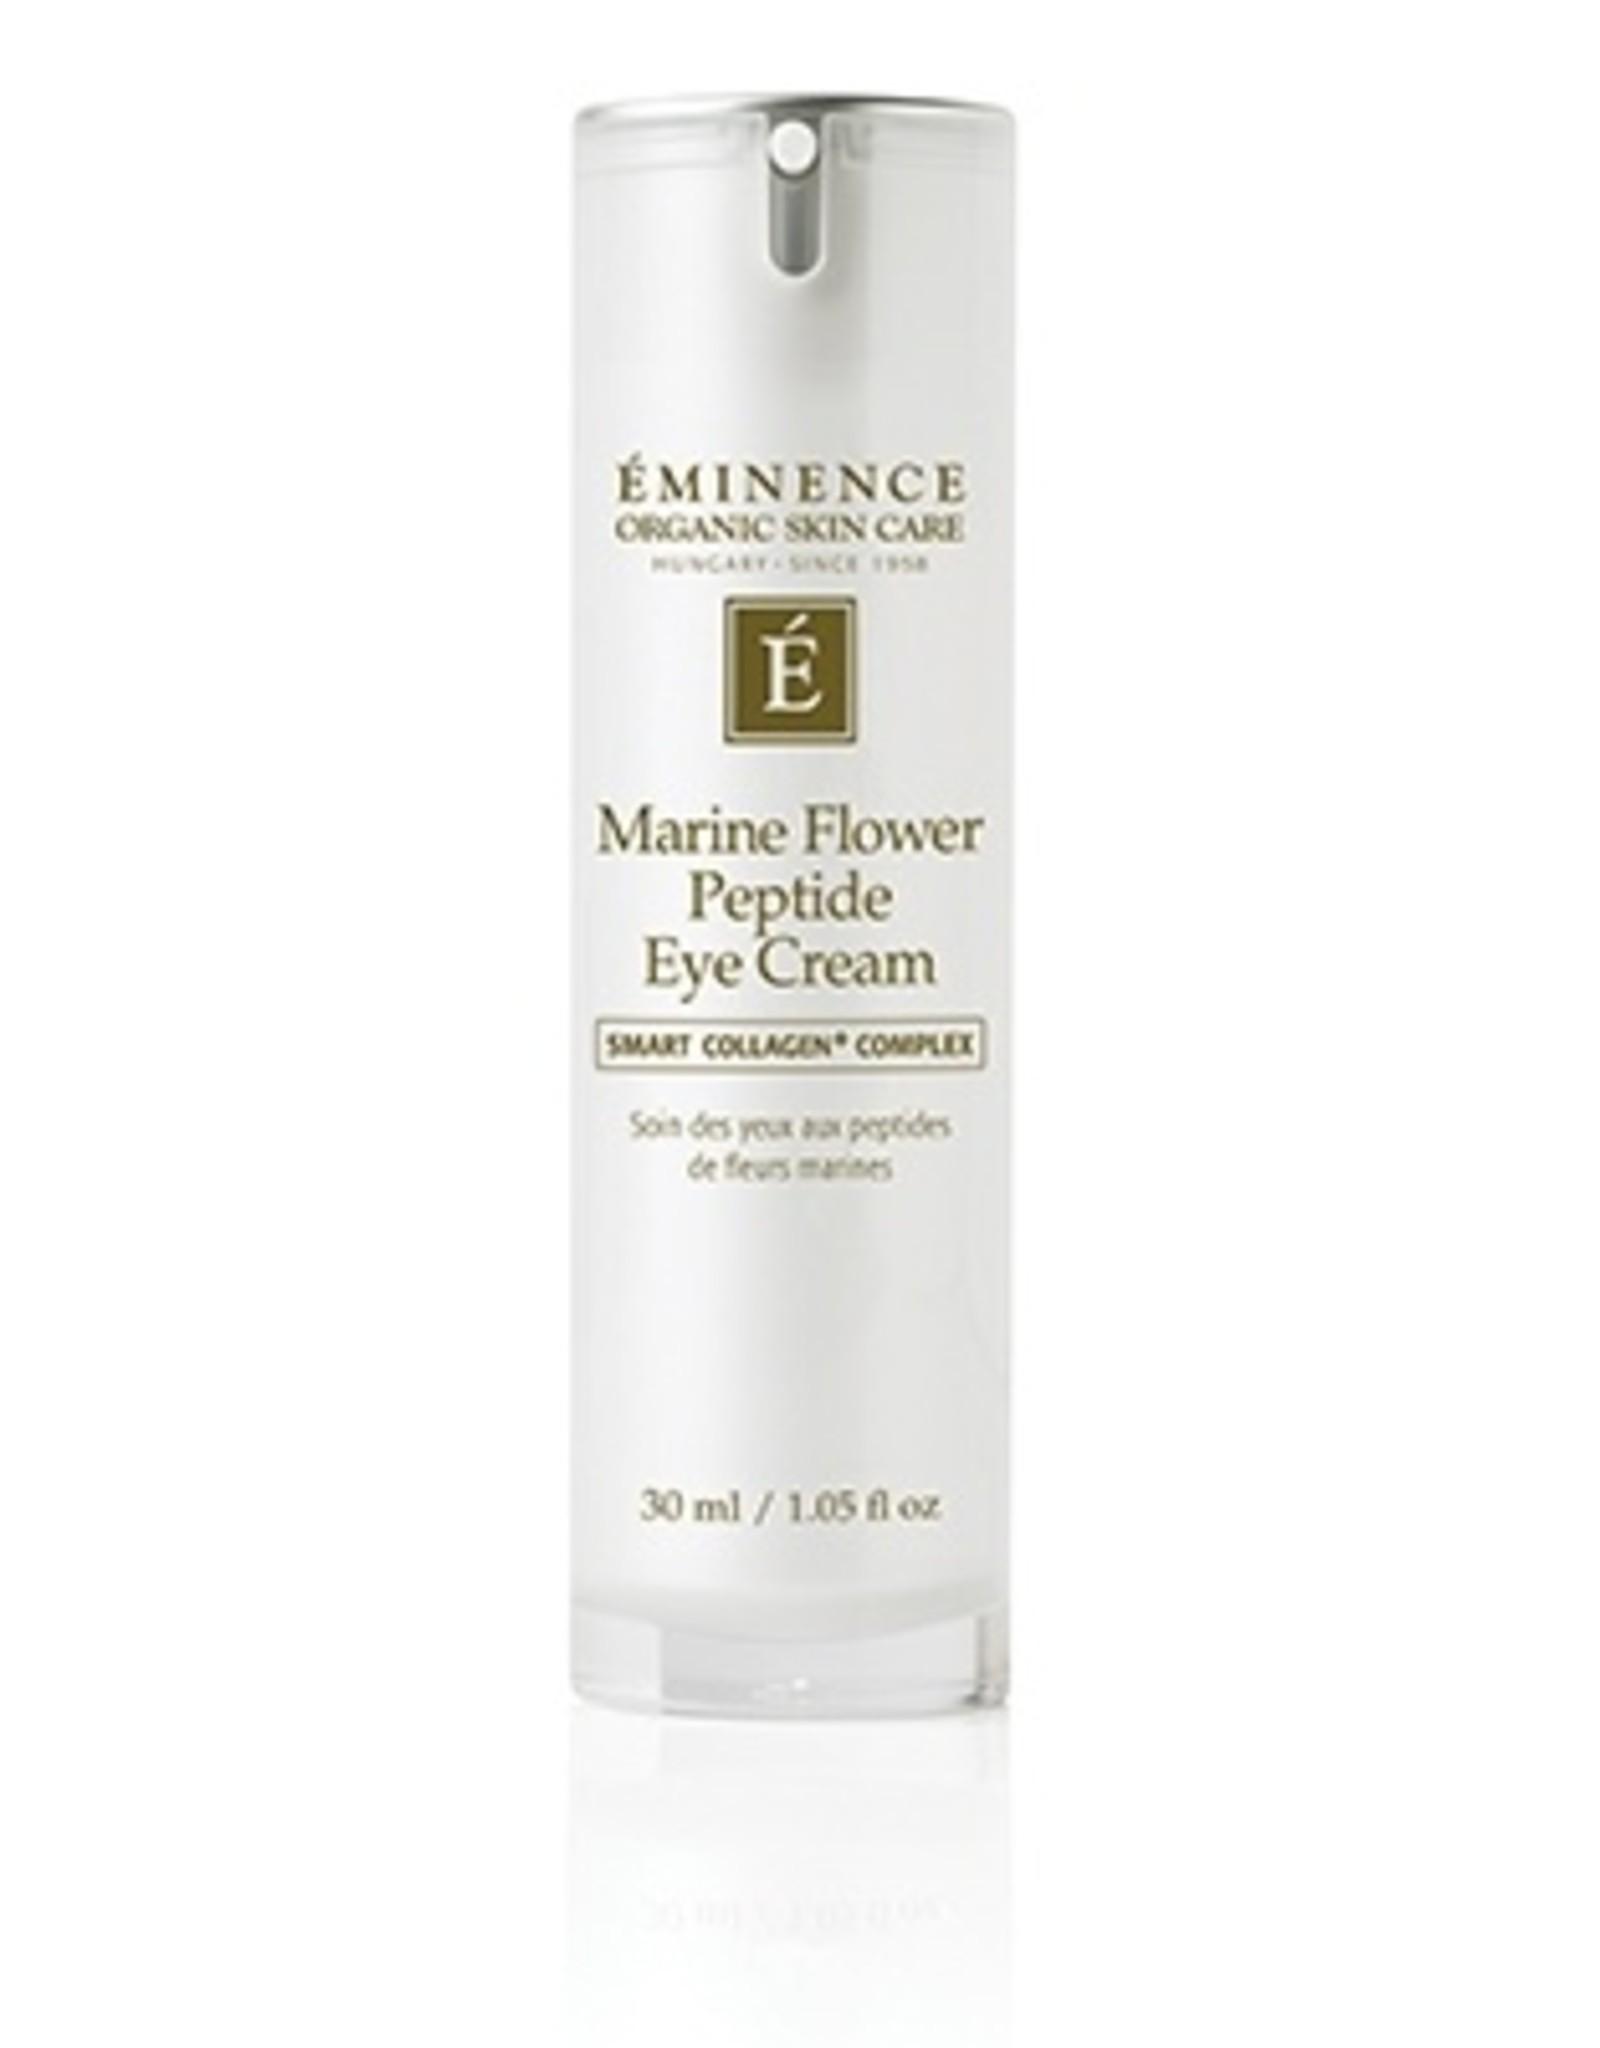 Eminence Organic Skin Care Marine Flower Peptide Eye Cream